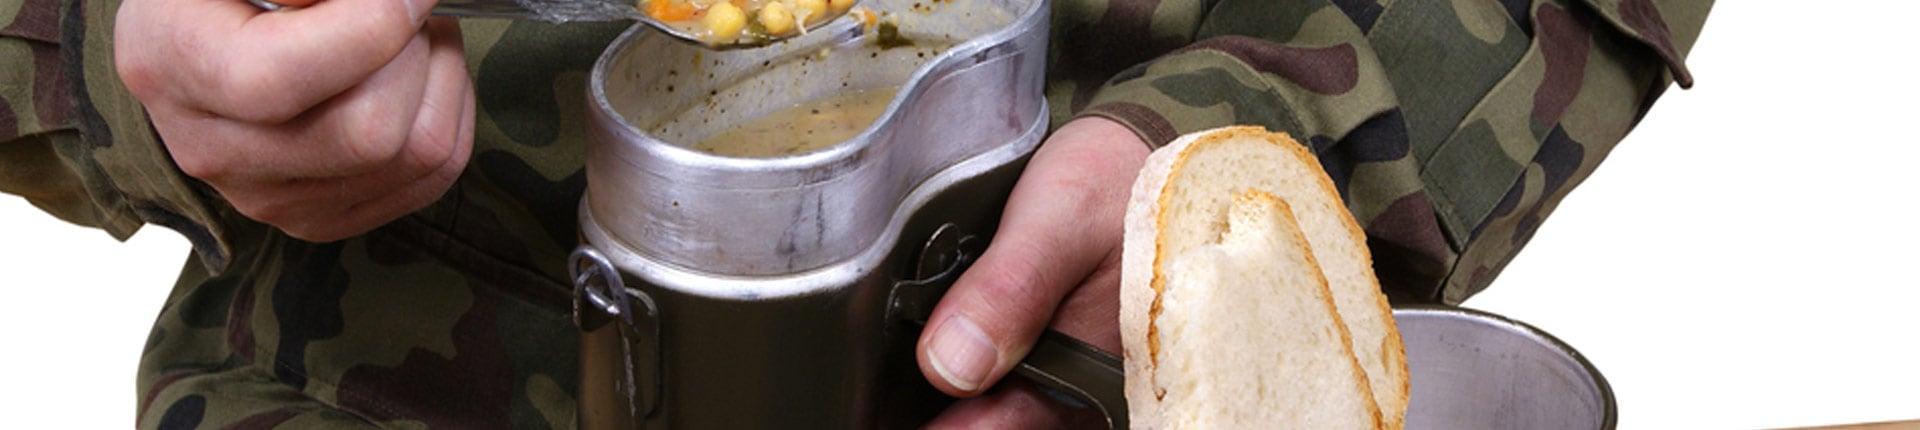 Dieta militarna - hit czy kit?